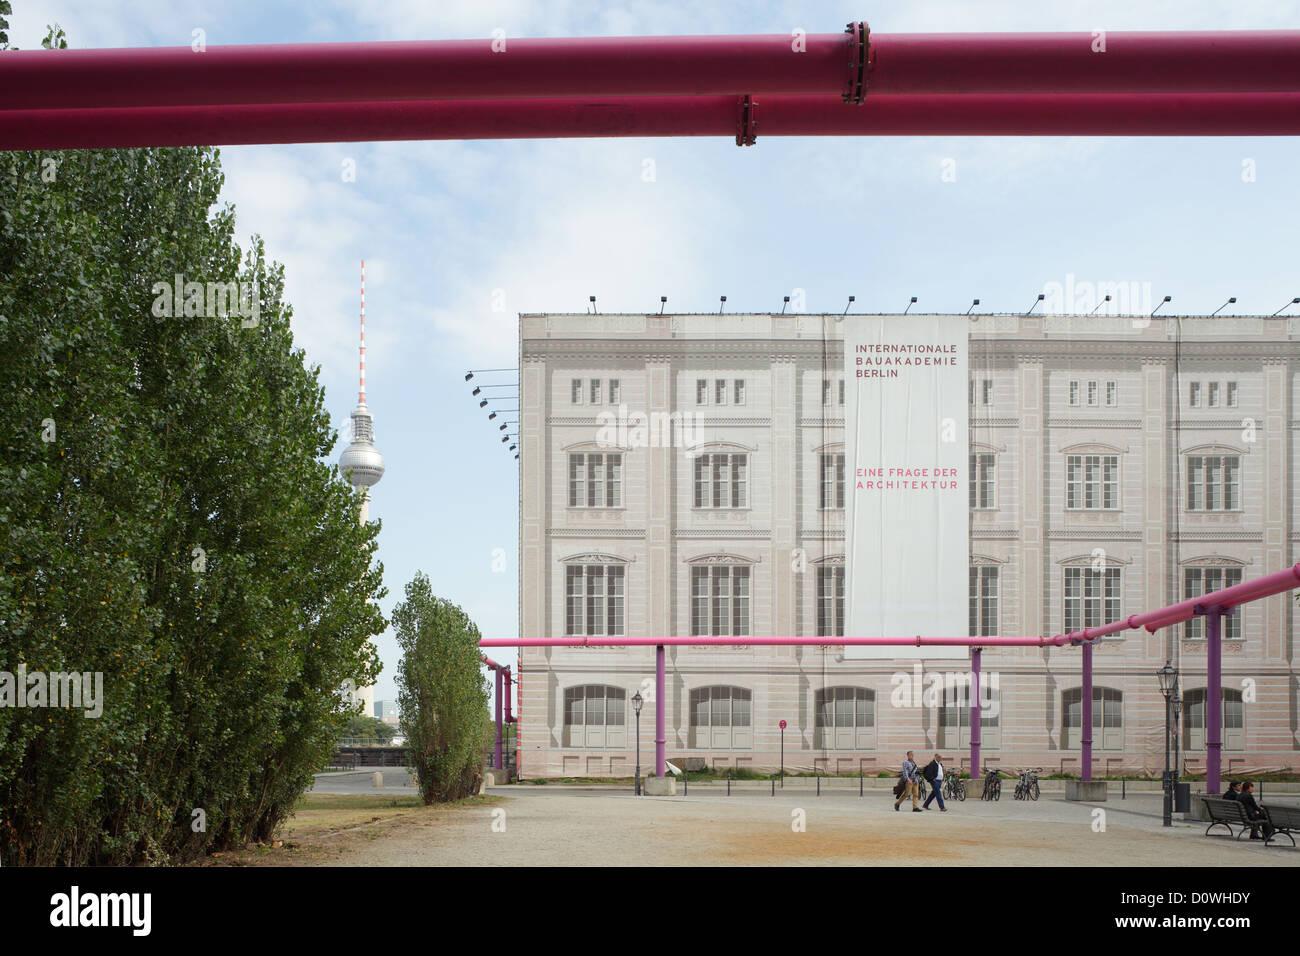 Berlin, Germany, plans to recreate the School of Architecture at Schinkelplatz - Stock Image